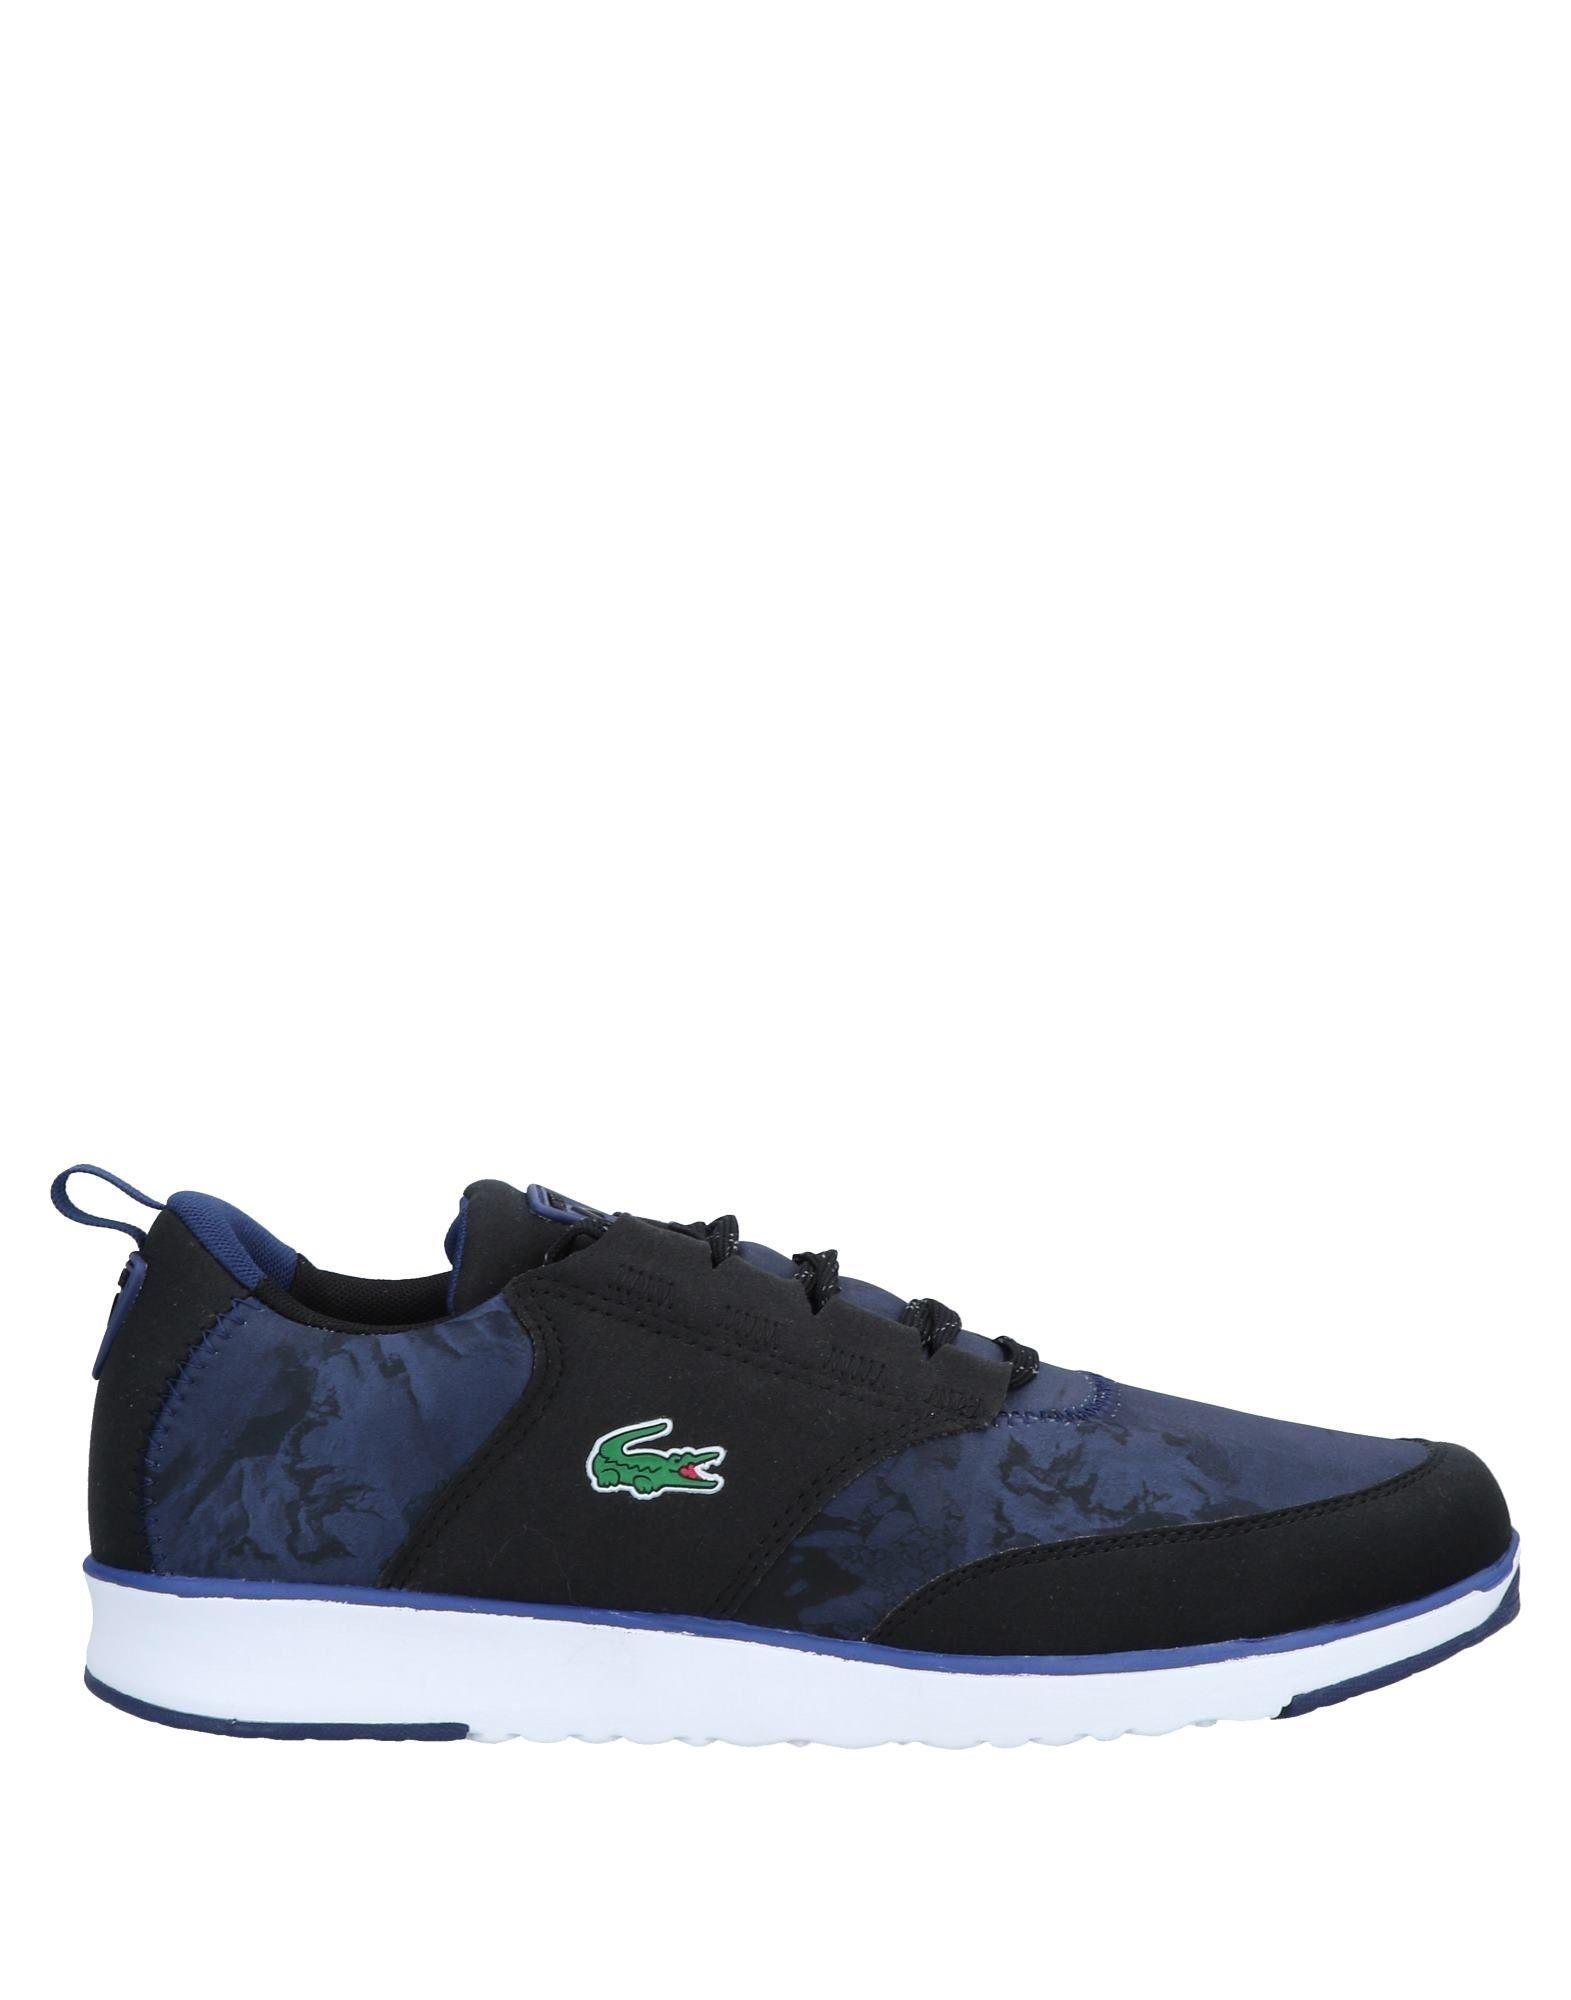 Lacoste Sneakers Sneakers - Men Lacoste Sneakers Lacoste online on  Australia - 11568229TG 0f0257